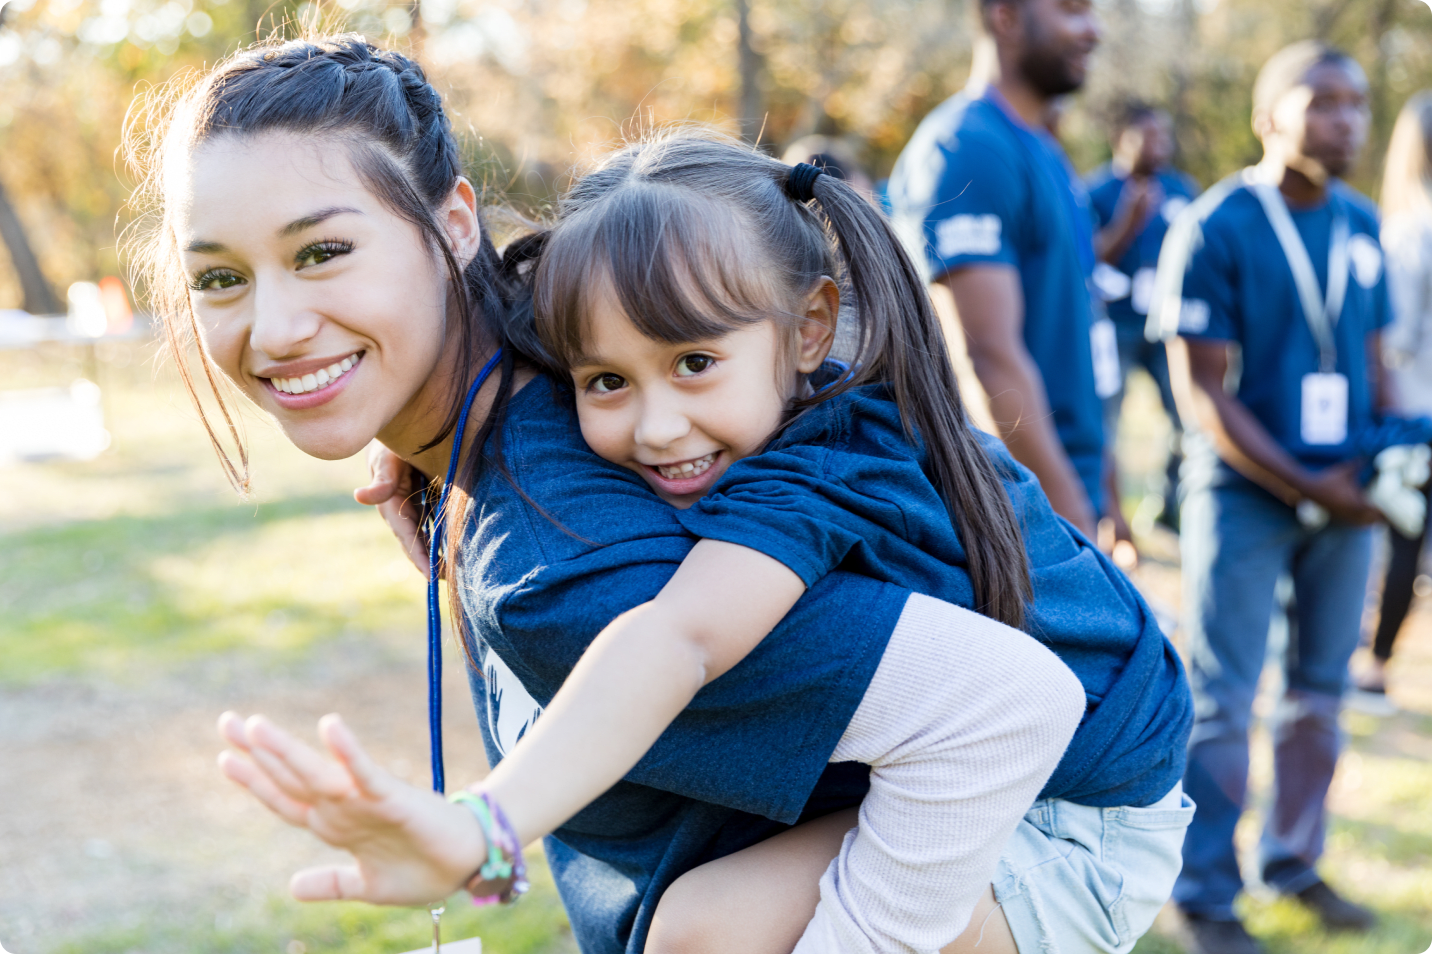 Female volunteer with little girl